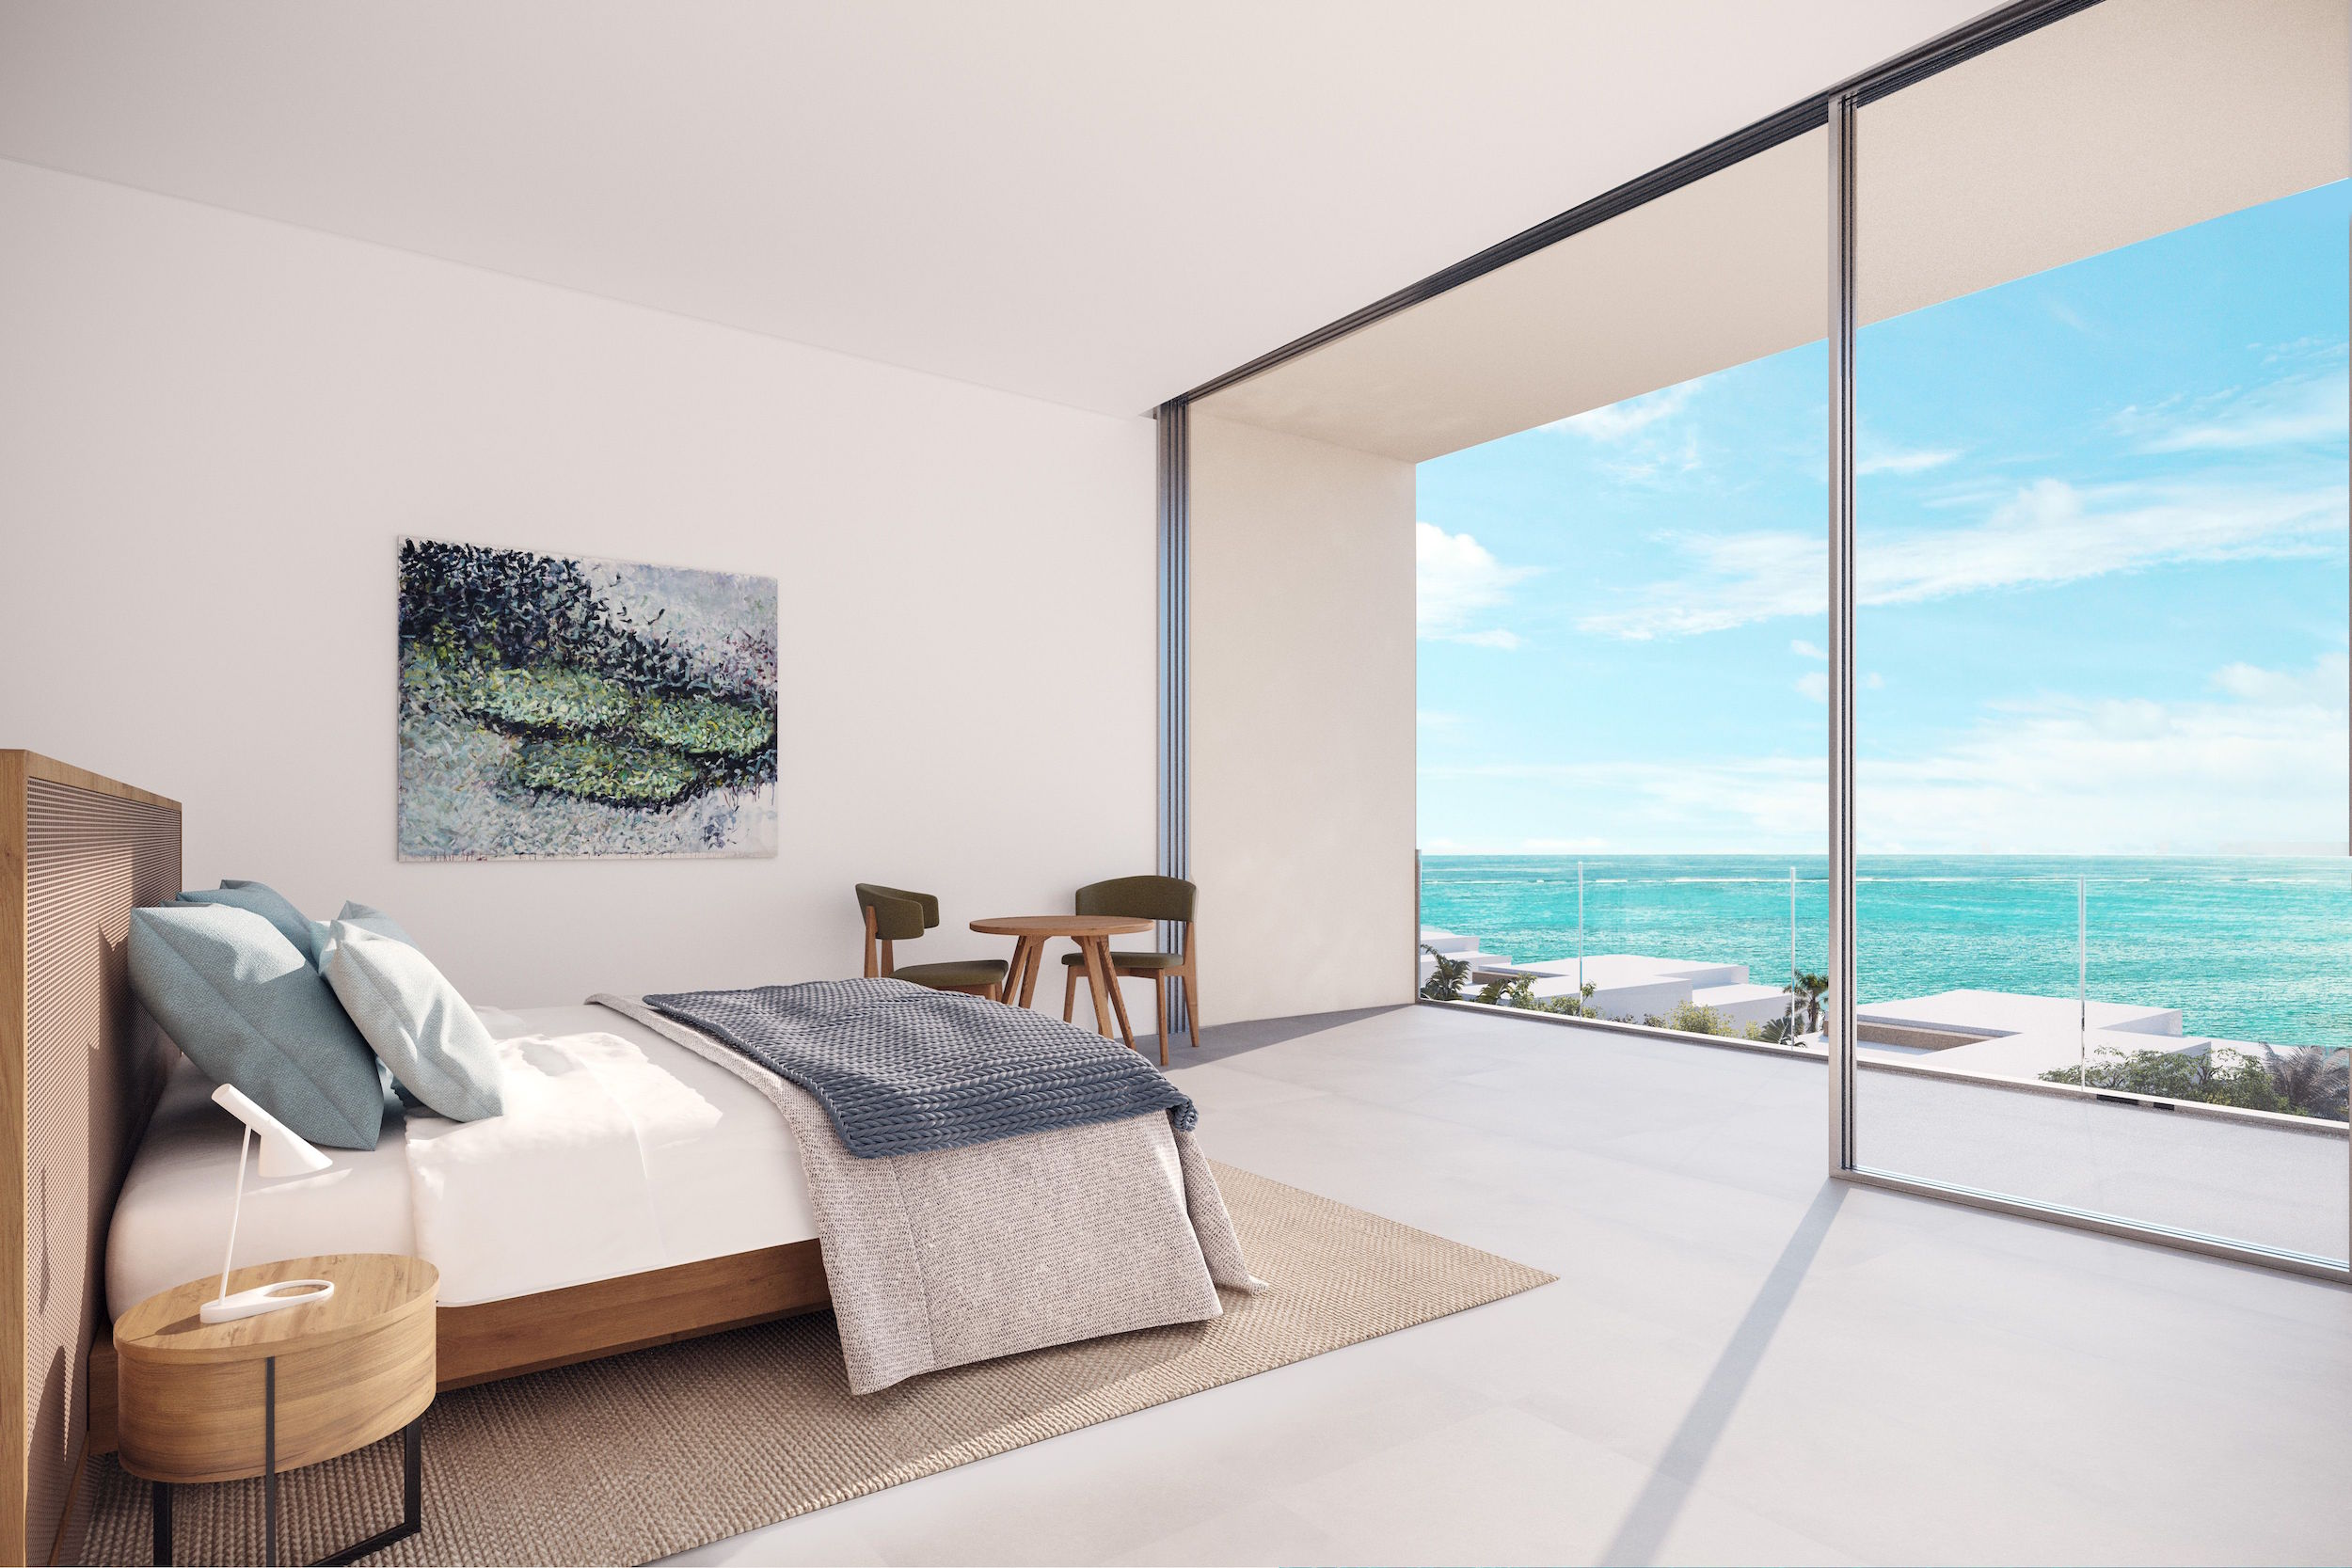 Beach Enclave Turks & Caicos Mar2021 1